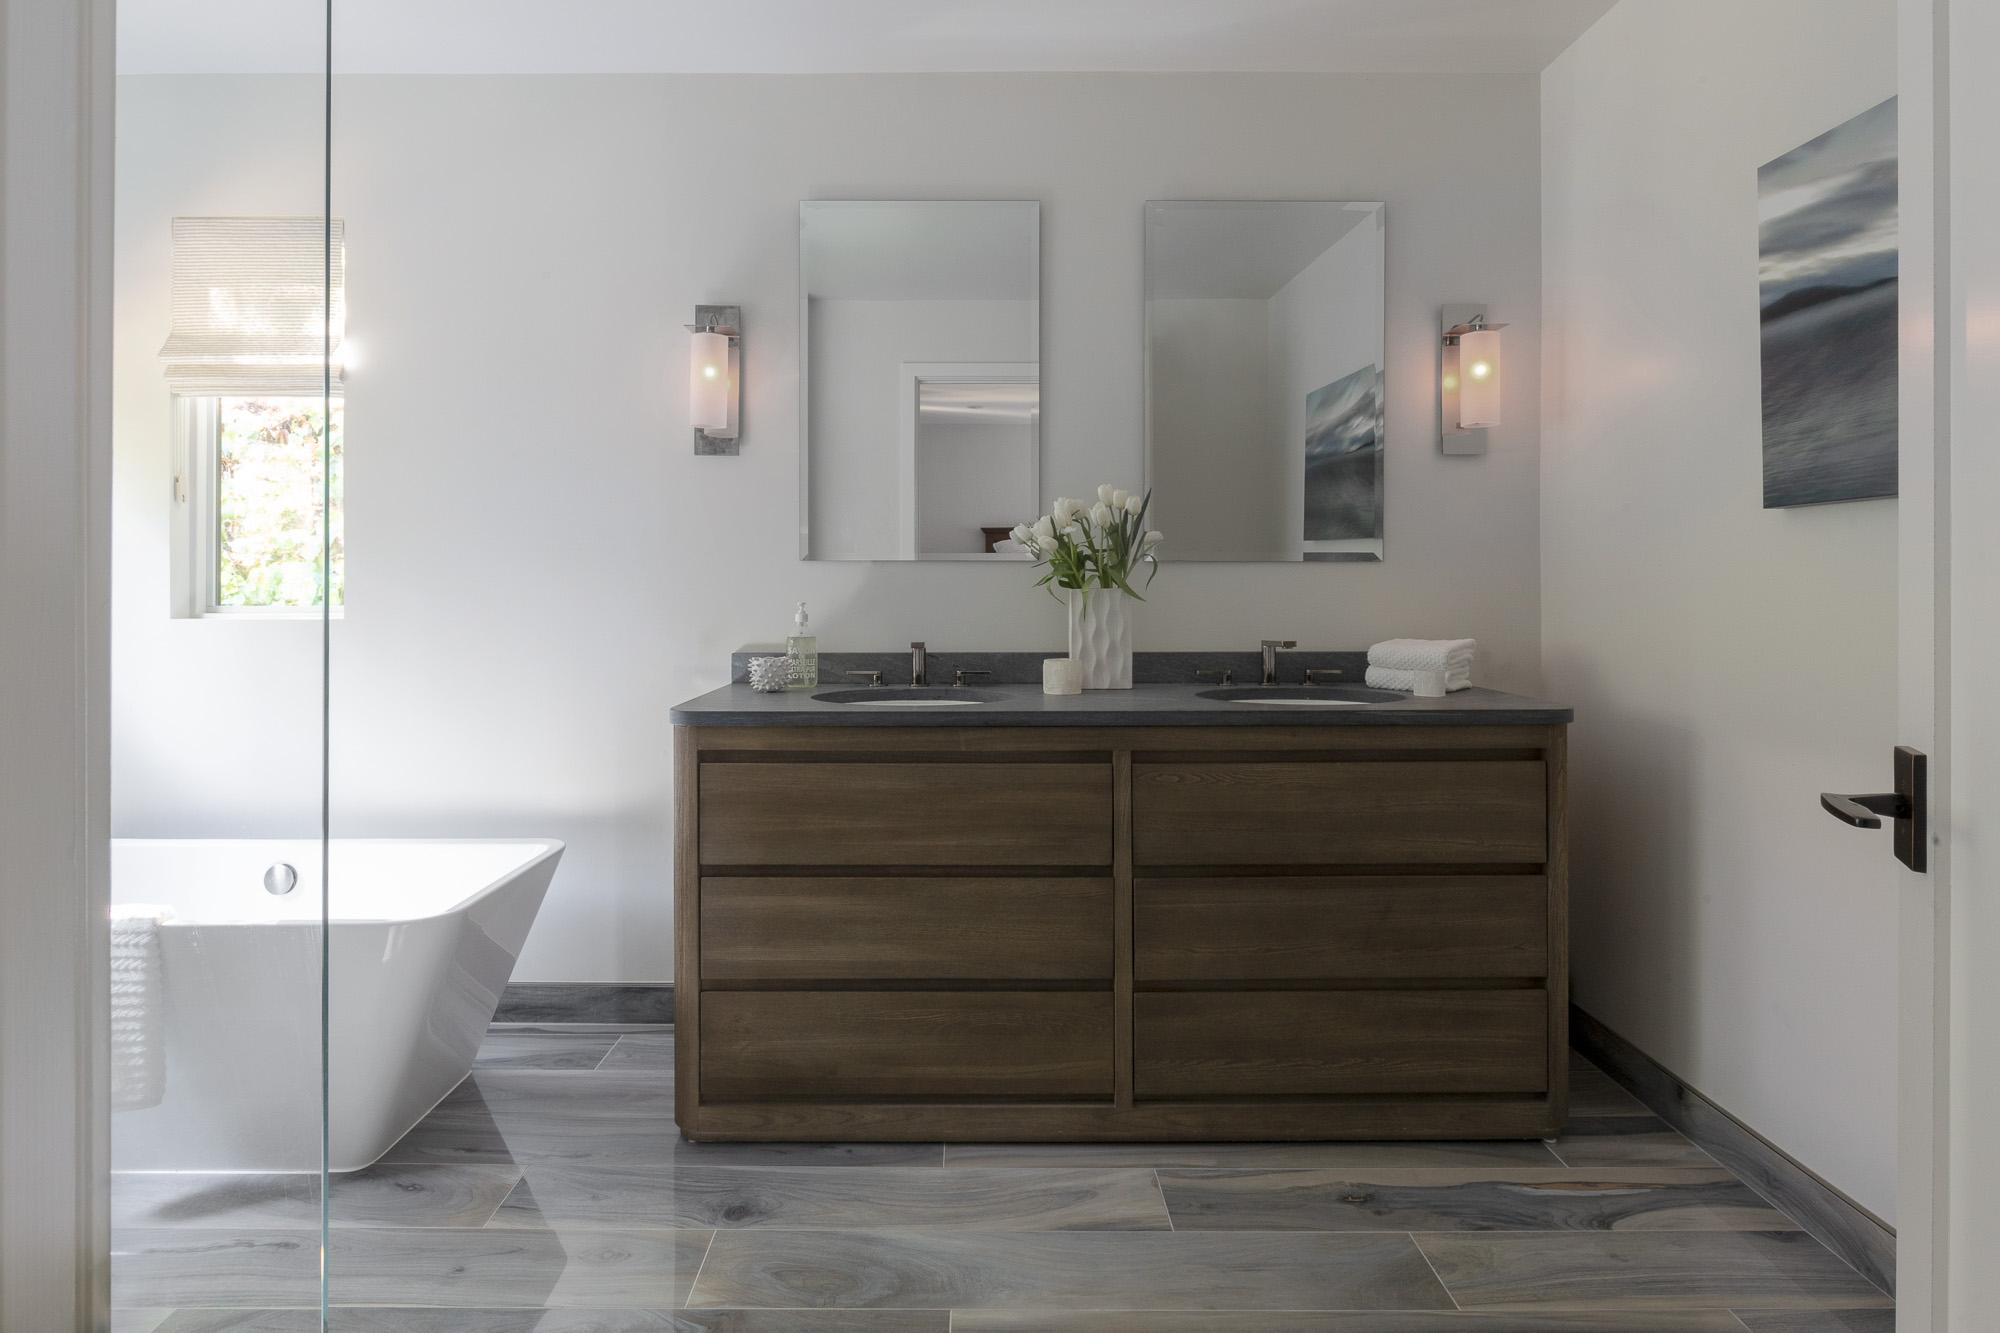 Bathroom Gallery Interior Designer Moraga Lafayette Orinda Kimberley Harrison Interiors